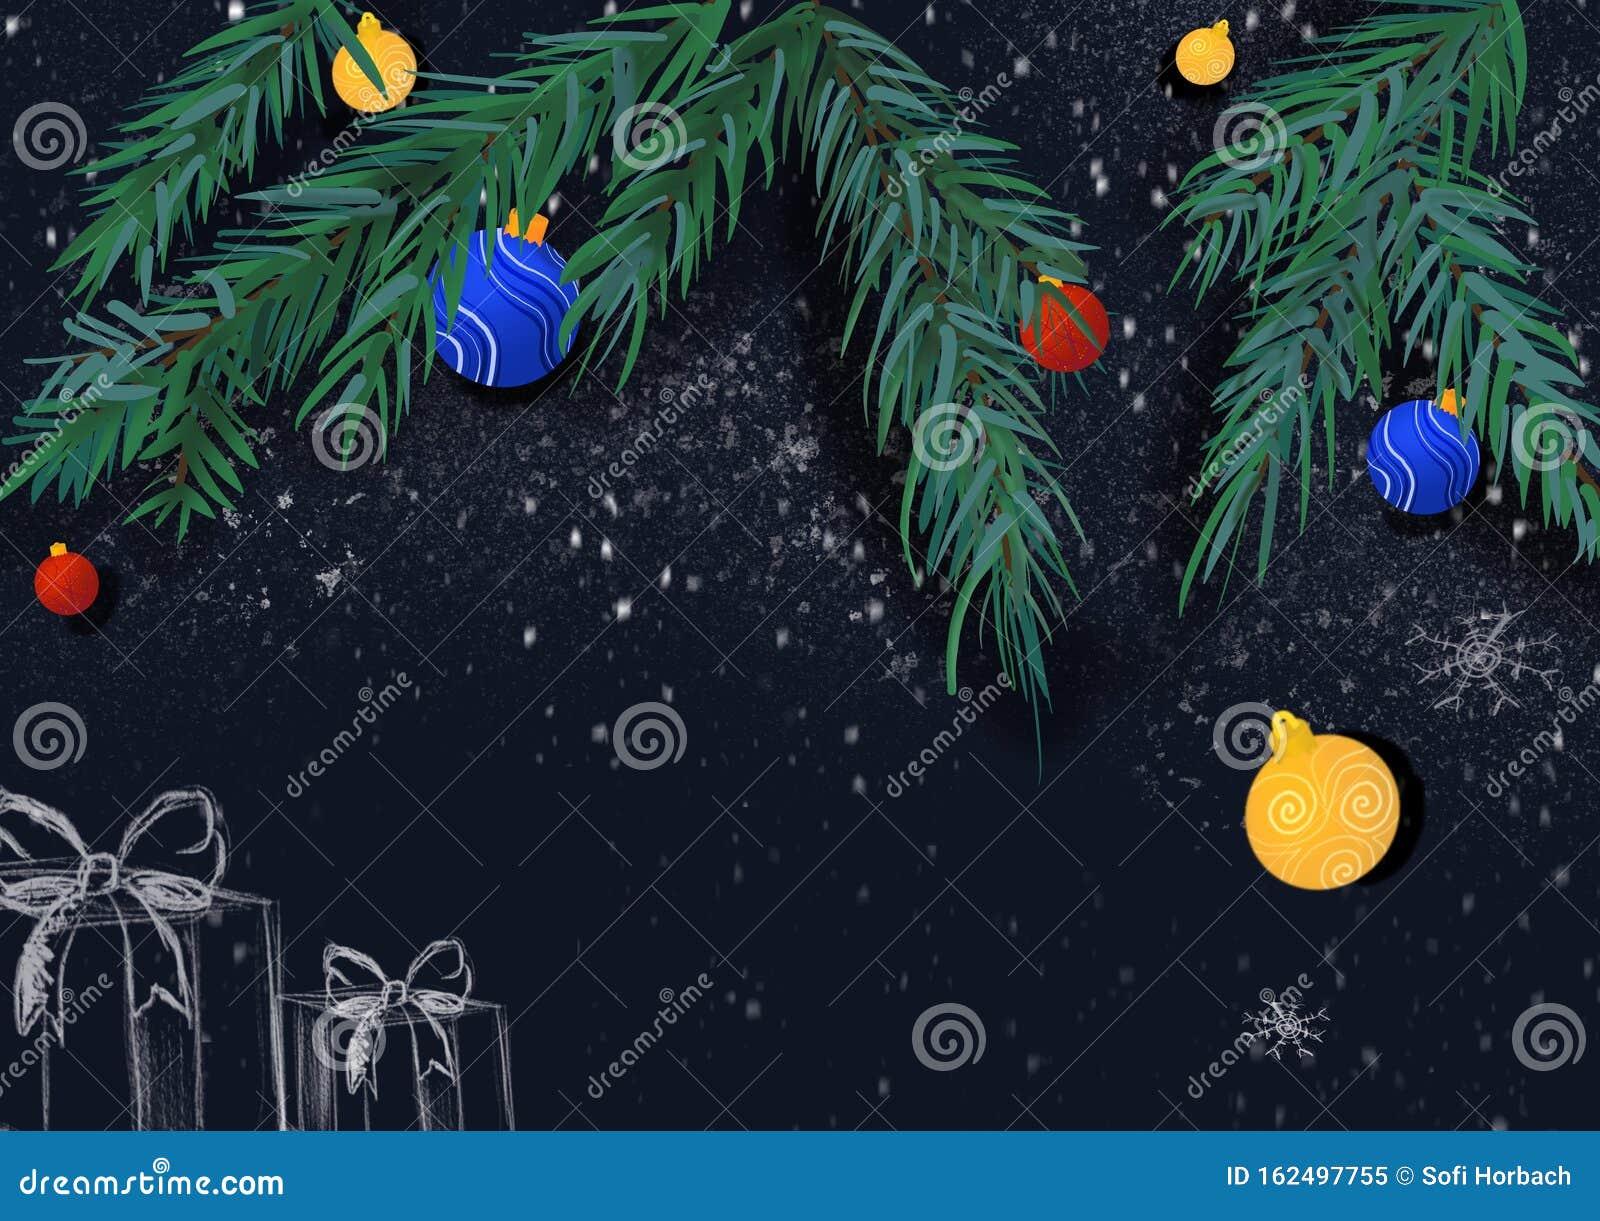 winter christmas wallpaper background design christmas tree orange winter christmas wallpaper background design 162497755